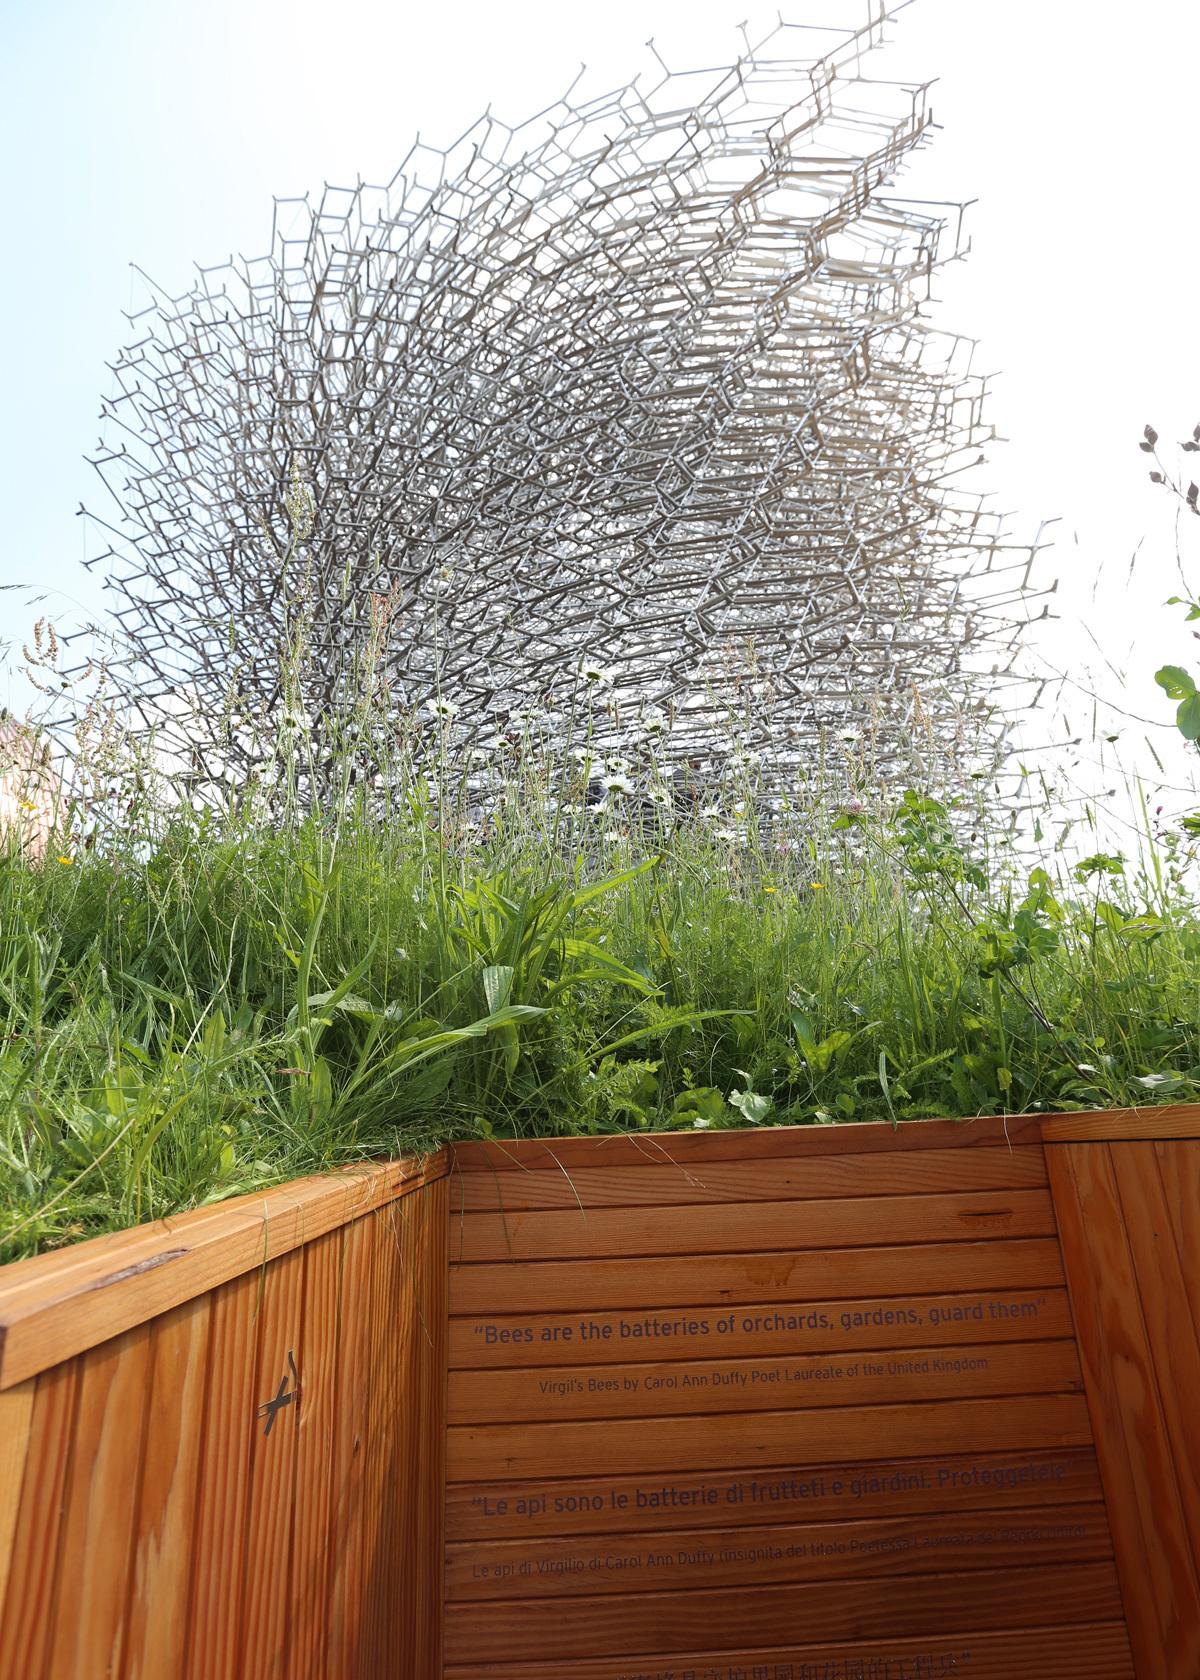 Expo 2015, UK Pavilion, Milan, Italy - Volume et transparence - La ruche - Architects BDP - Artist Wolfgang Buttress - Photo Jean-Yves Soetinck